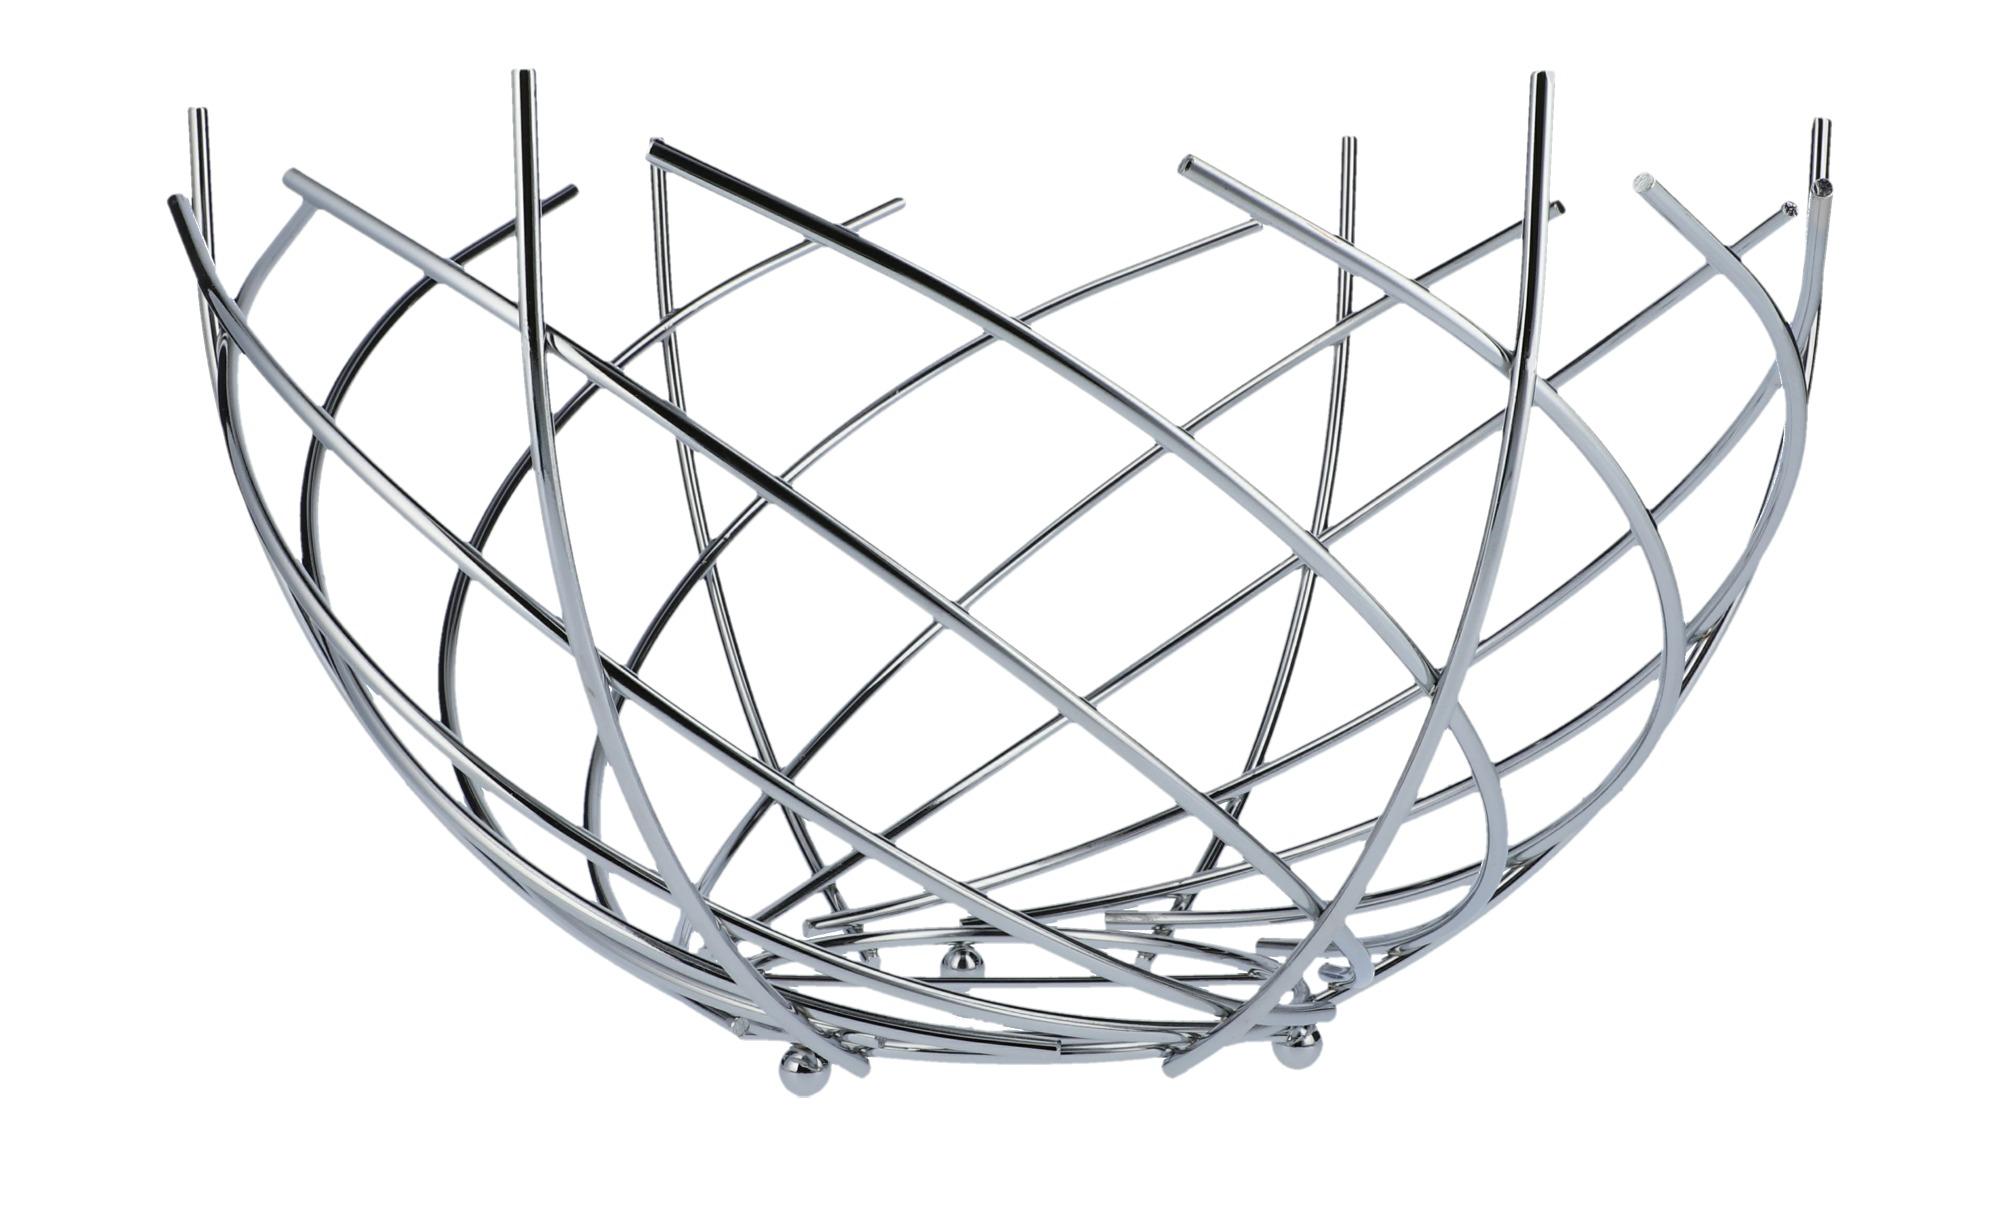 Kesper Brot-/& Obstkorb aus Edelstahl 26 x 26 x 11 cm Silber//schwarz